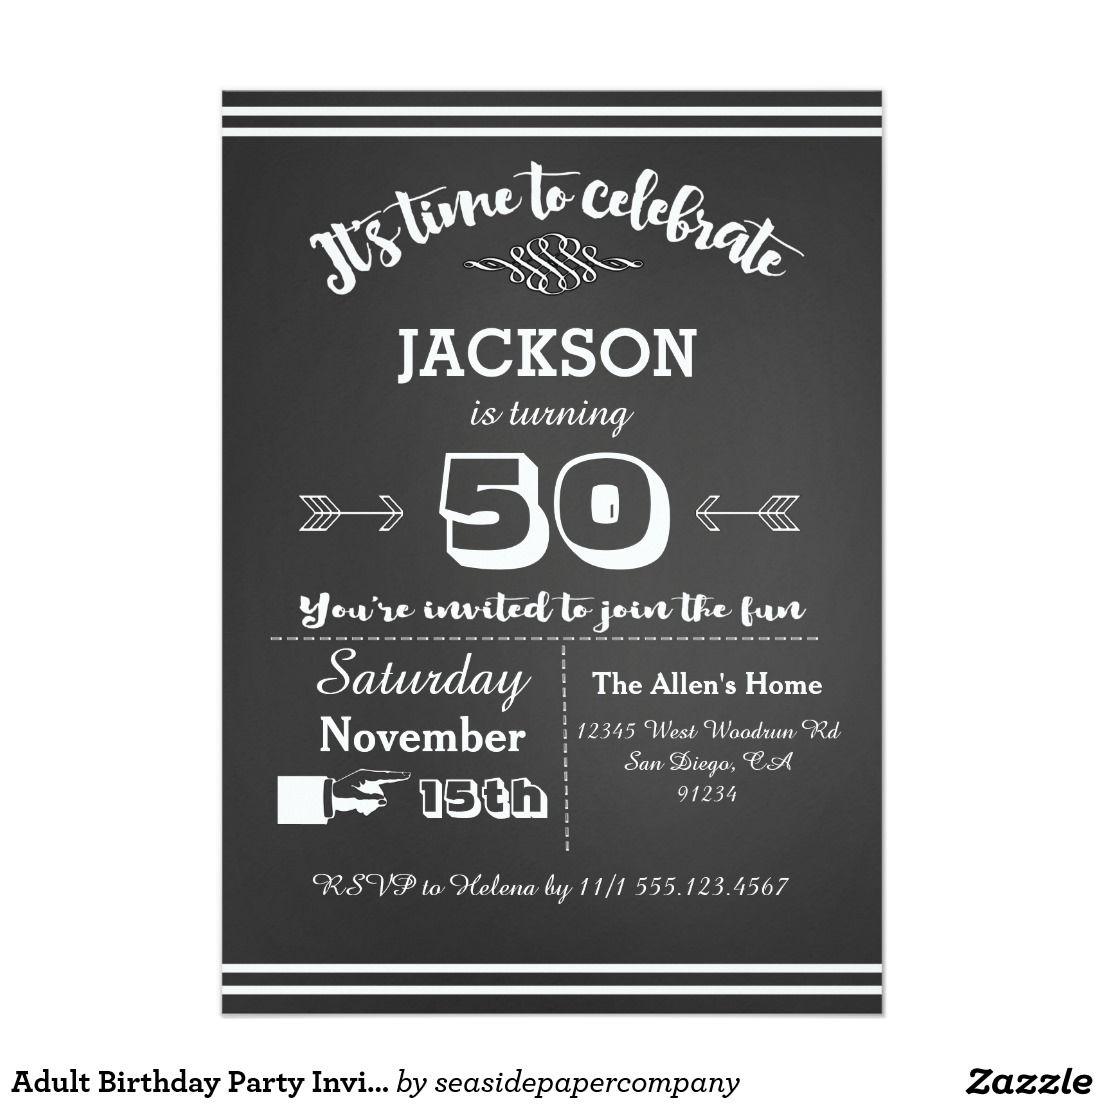 Adult birthday party invitation 50th 60th 40th adult birthday adult birthday party invitation 50th 60th 40th stopboris Choice Image